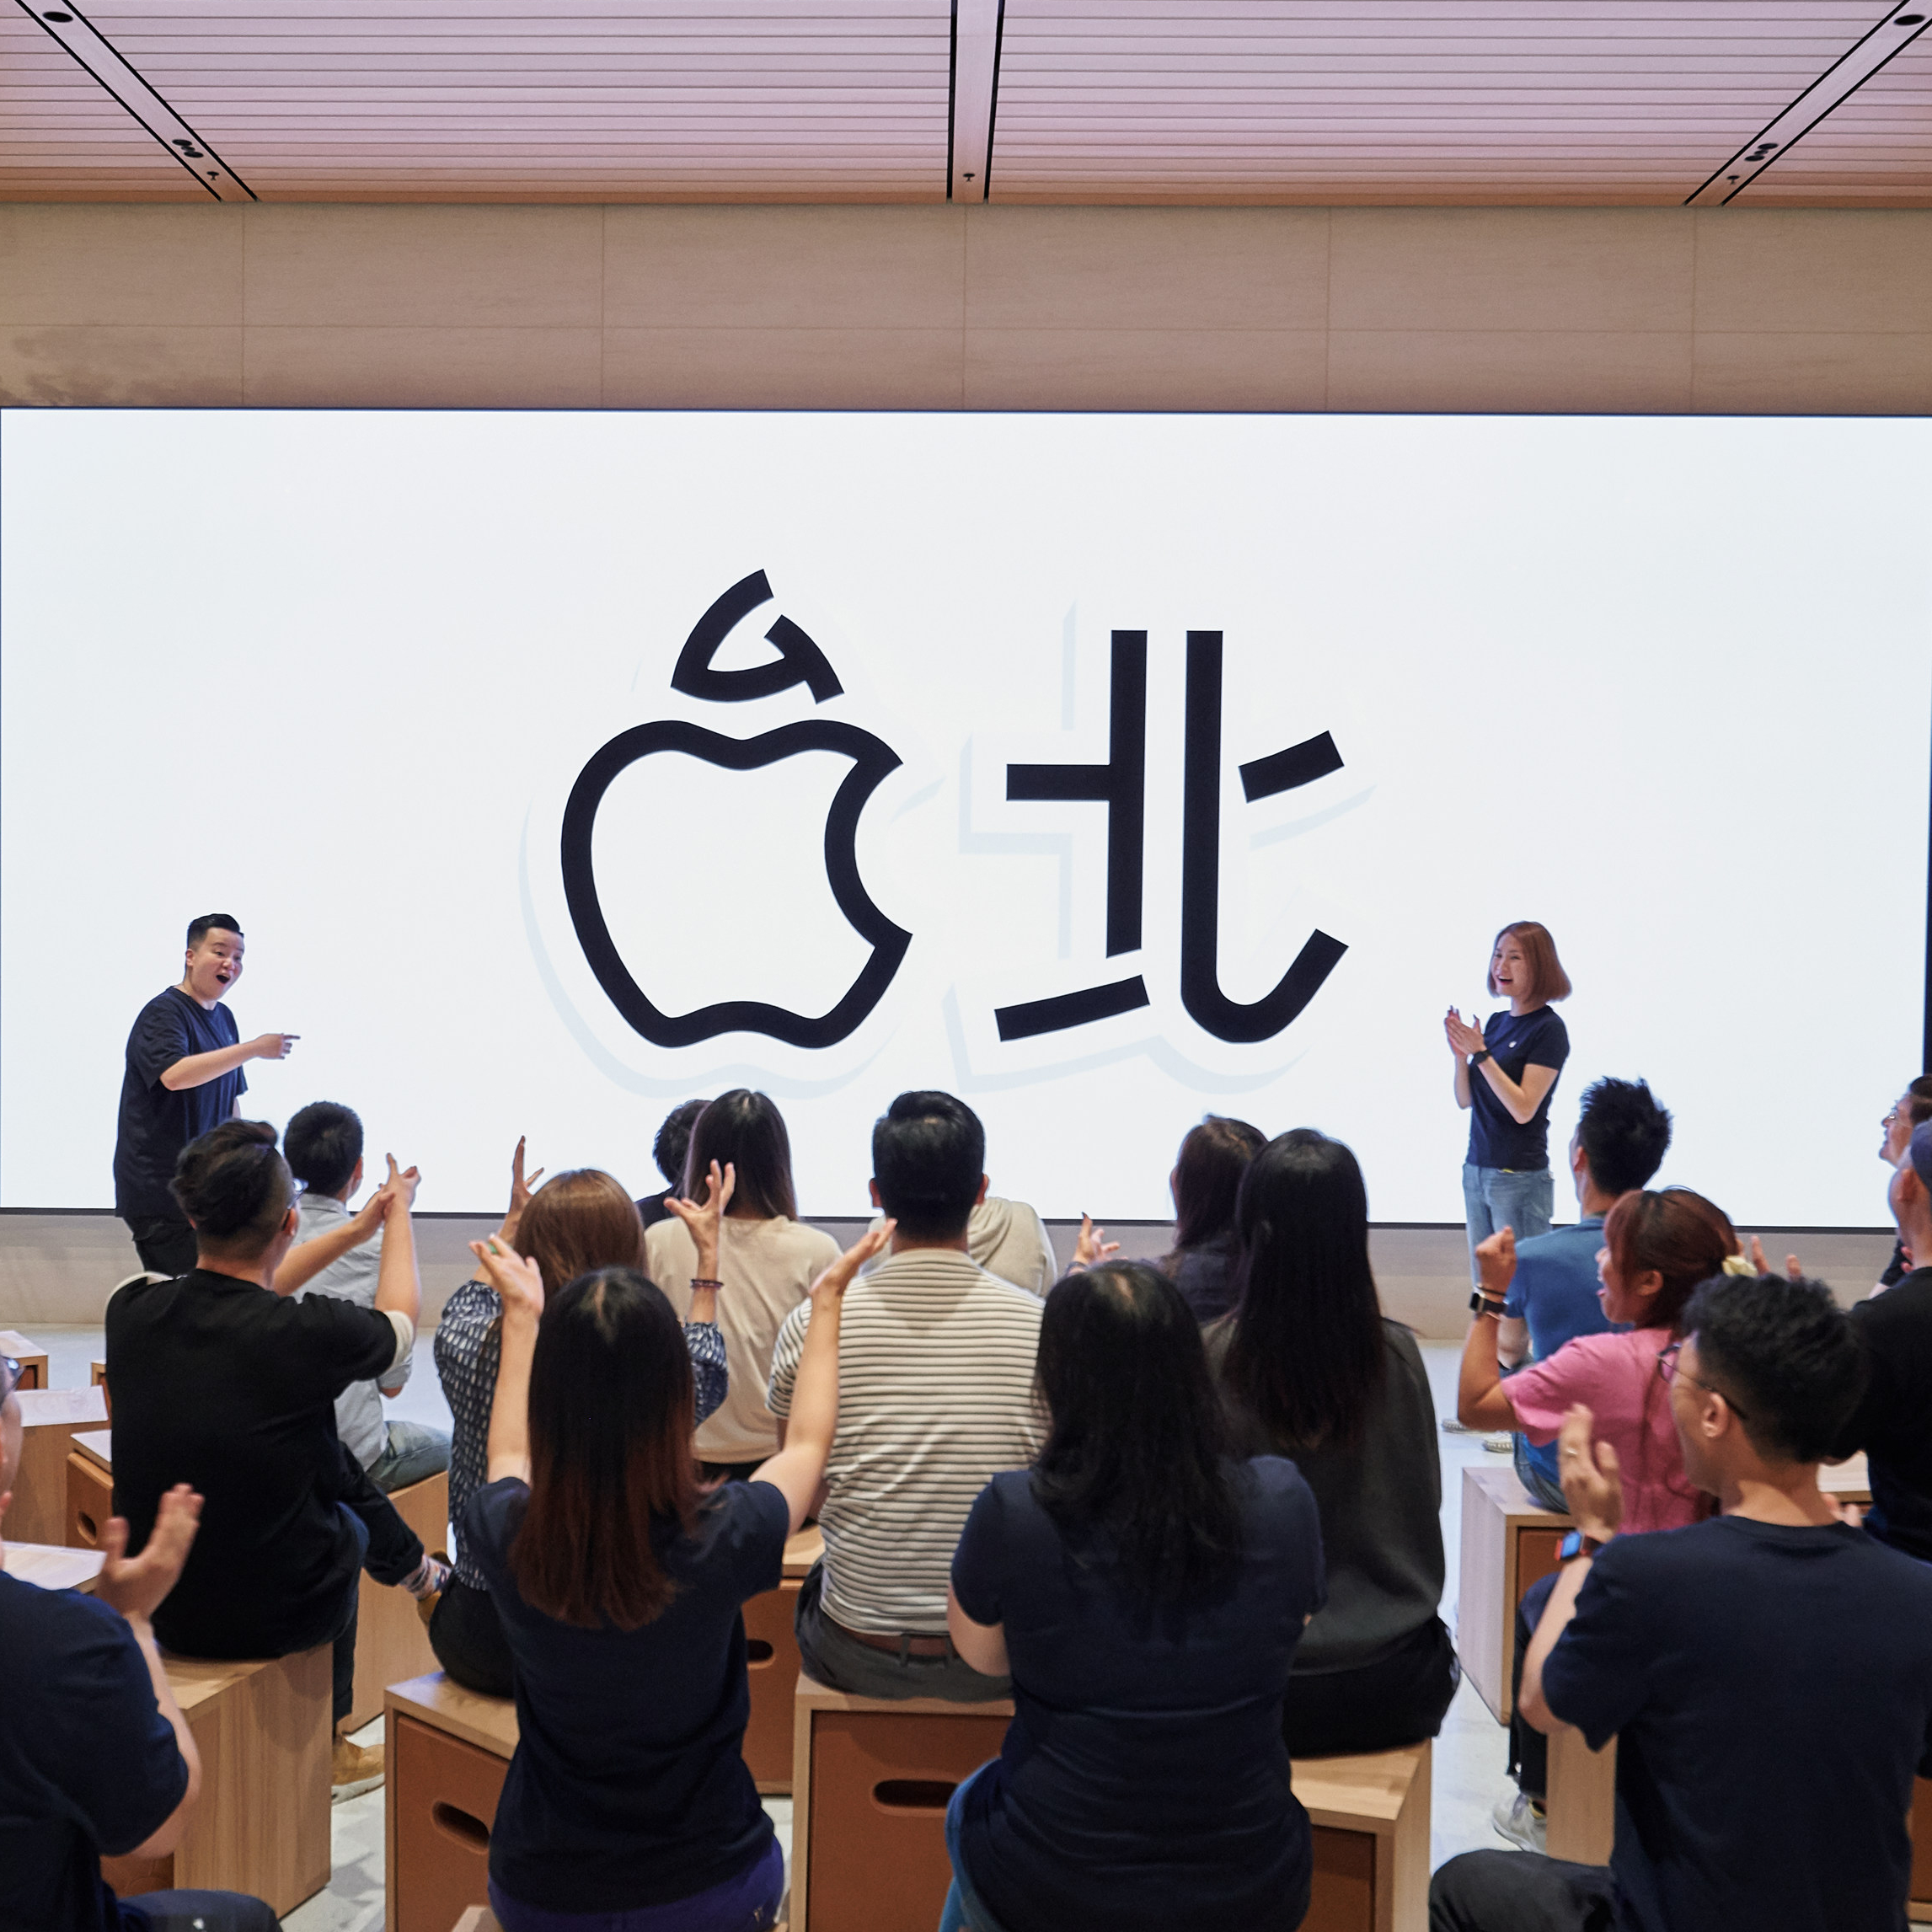 Apple 最新零售店信義 A13 即將開幕!首度在台舉辦由藝術家主持的 Today at Apple 課程